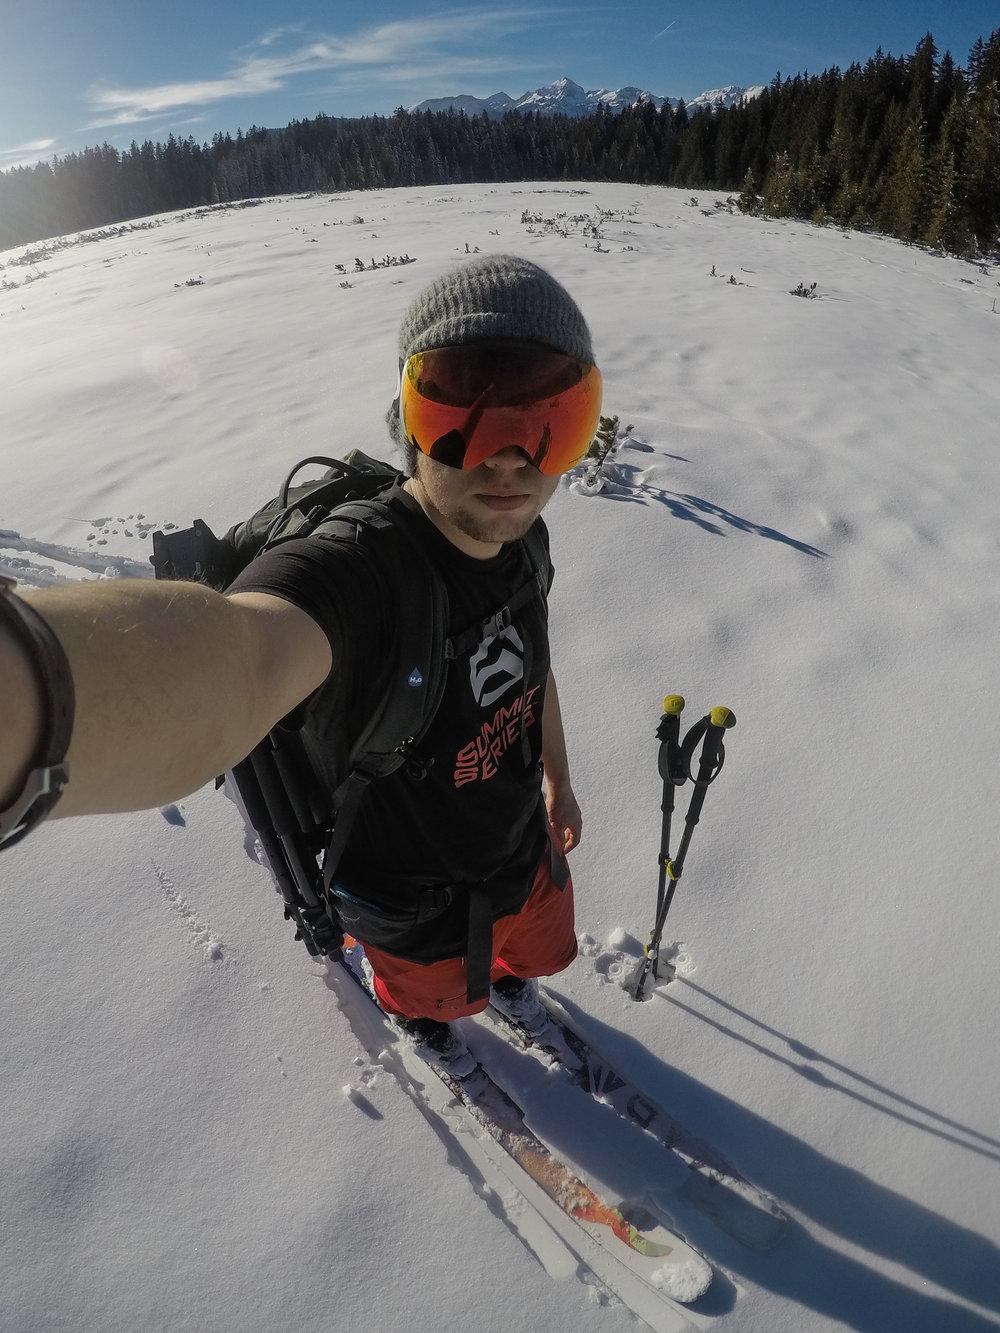 Ski touring in the Triglav National Park, Slovenia